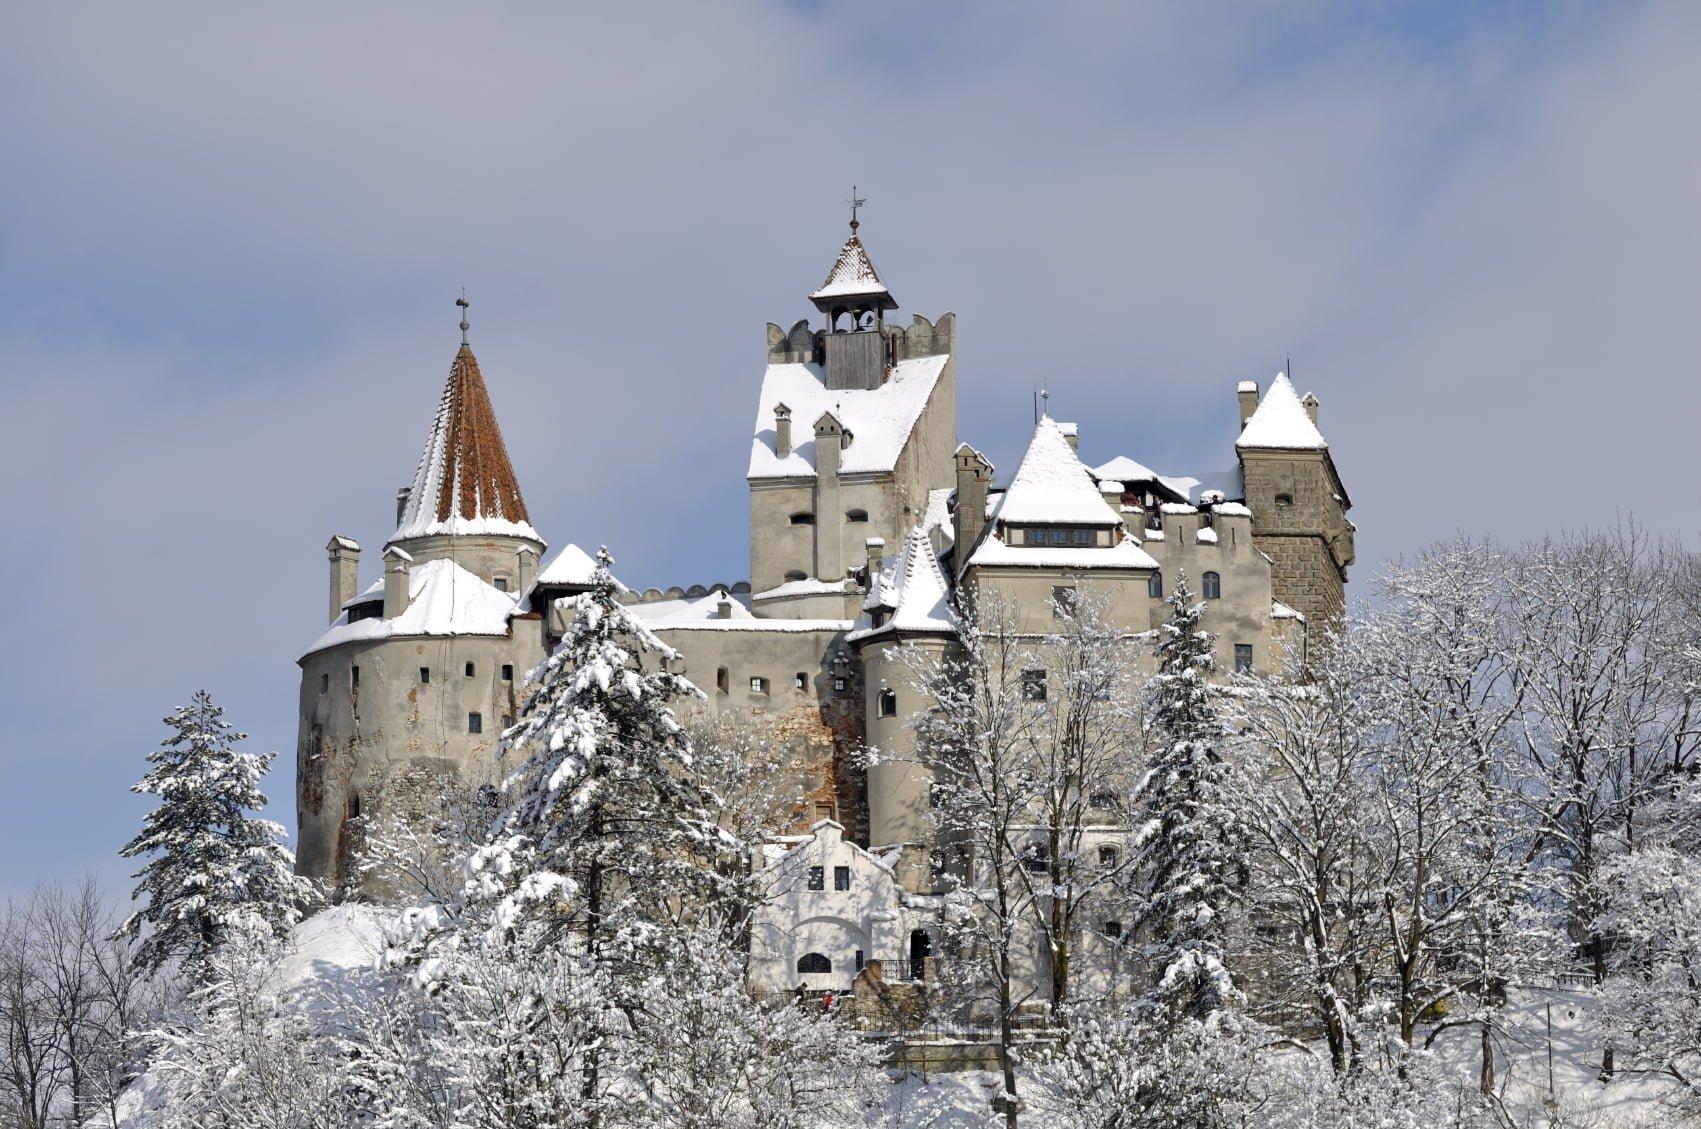 Top 10 destinatii de iarna ale Europei. Vezi ce loc din Romania apare in clasament. Foto+video